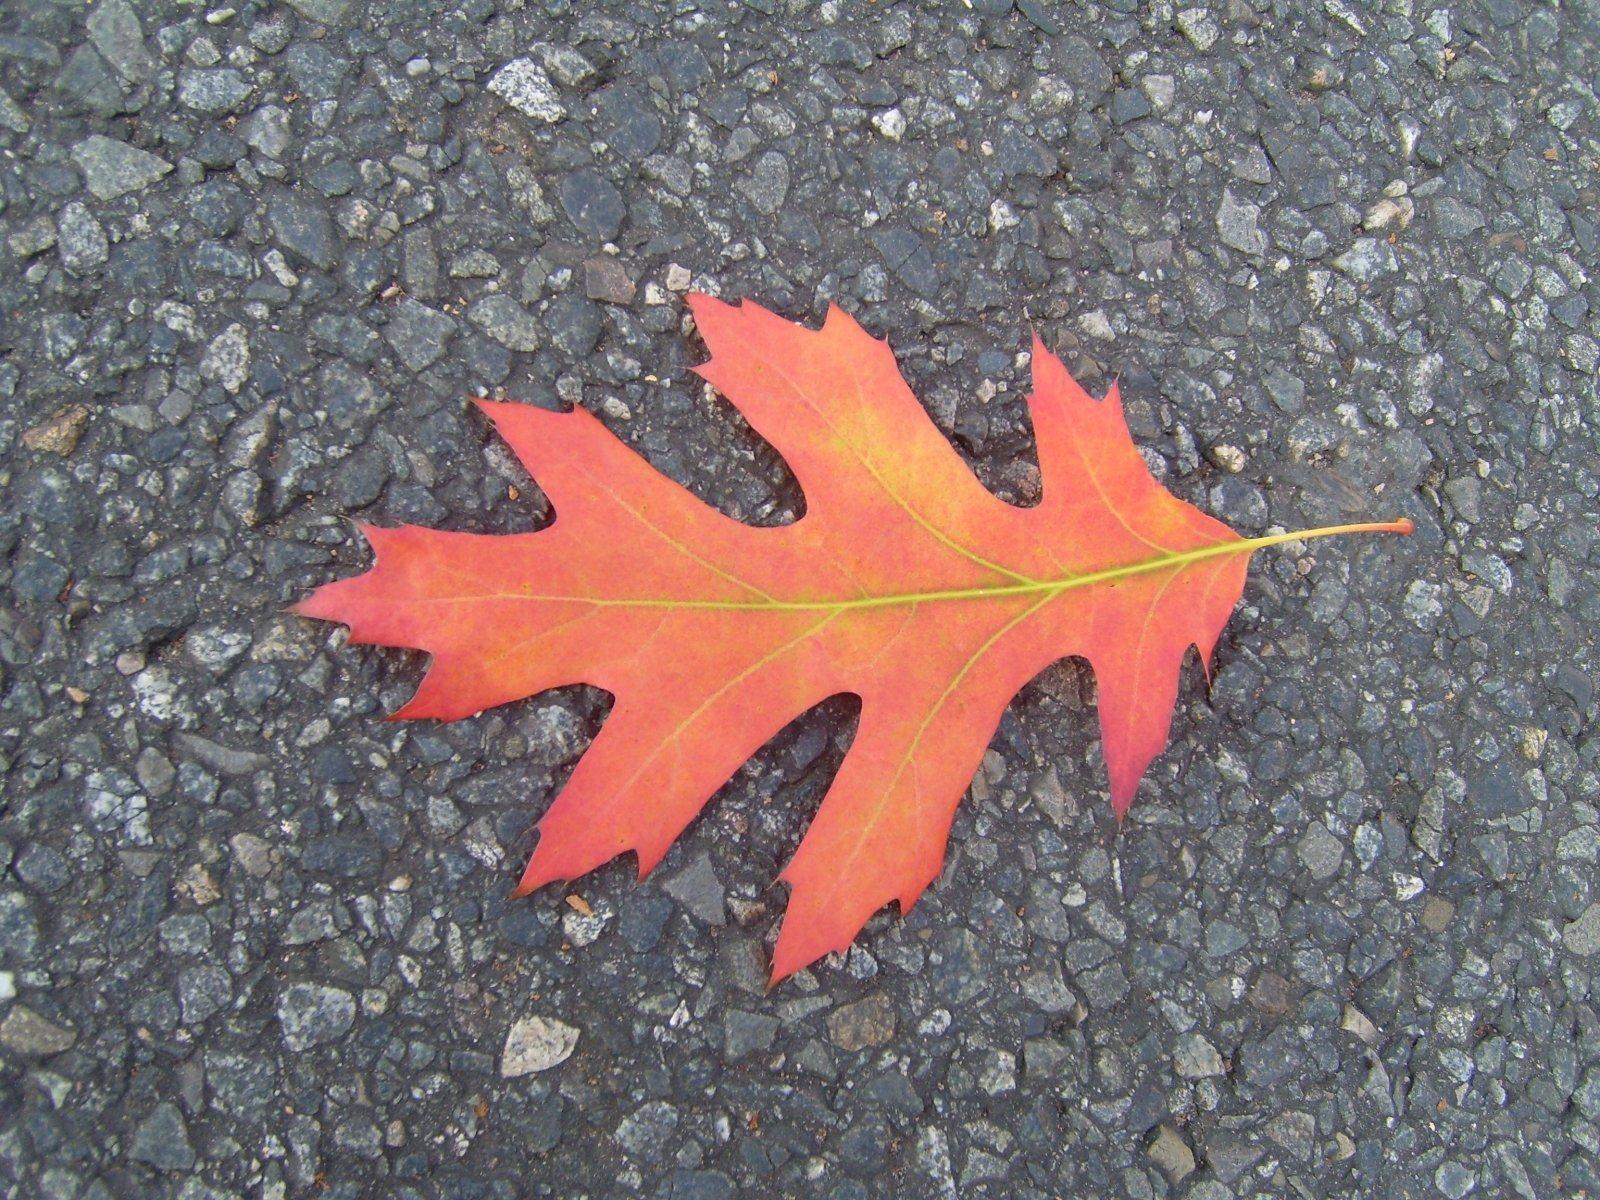 File:Red Autumn Leaf.jpg